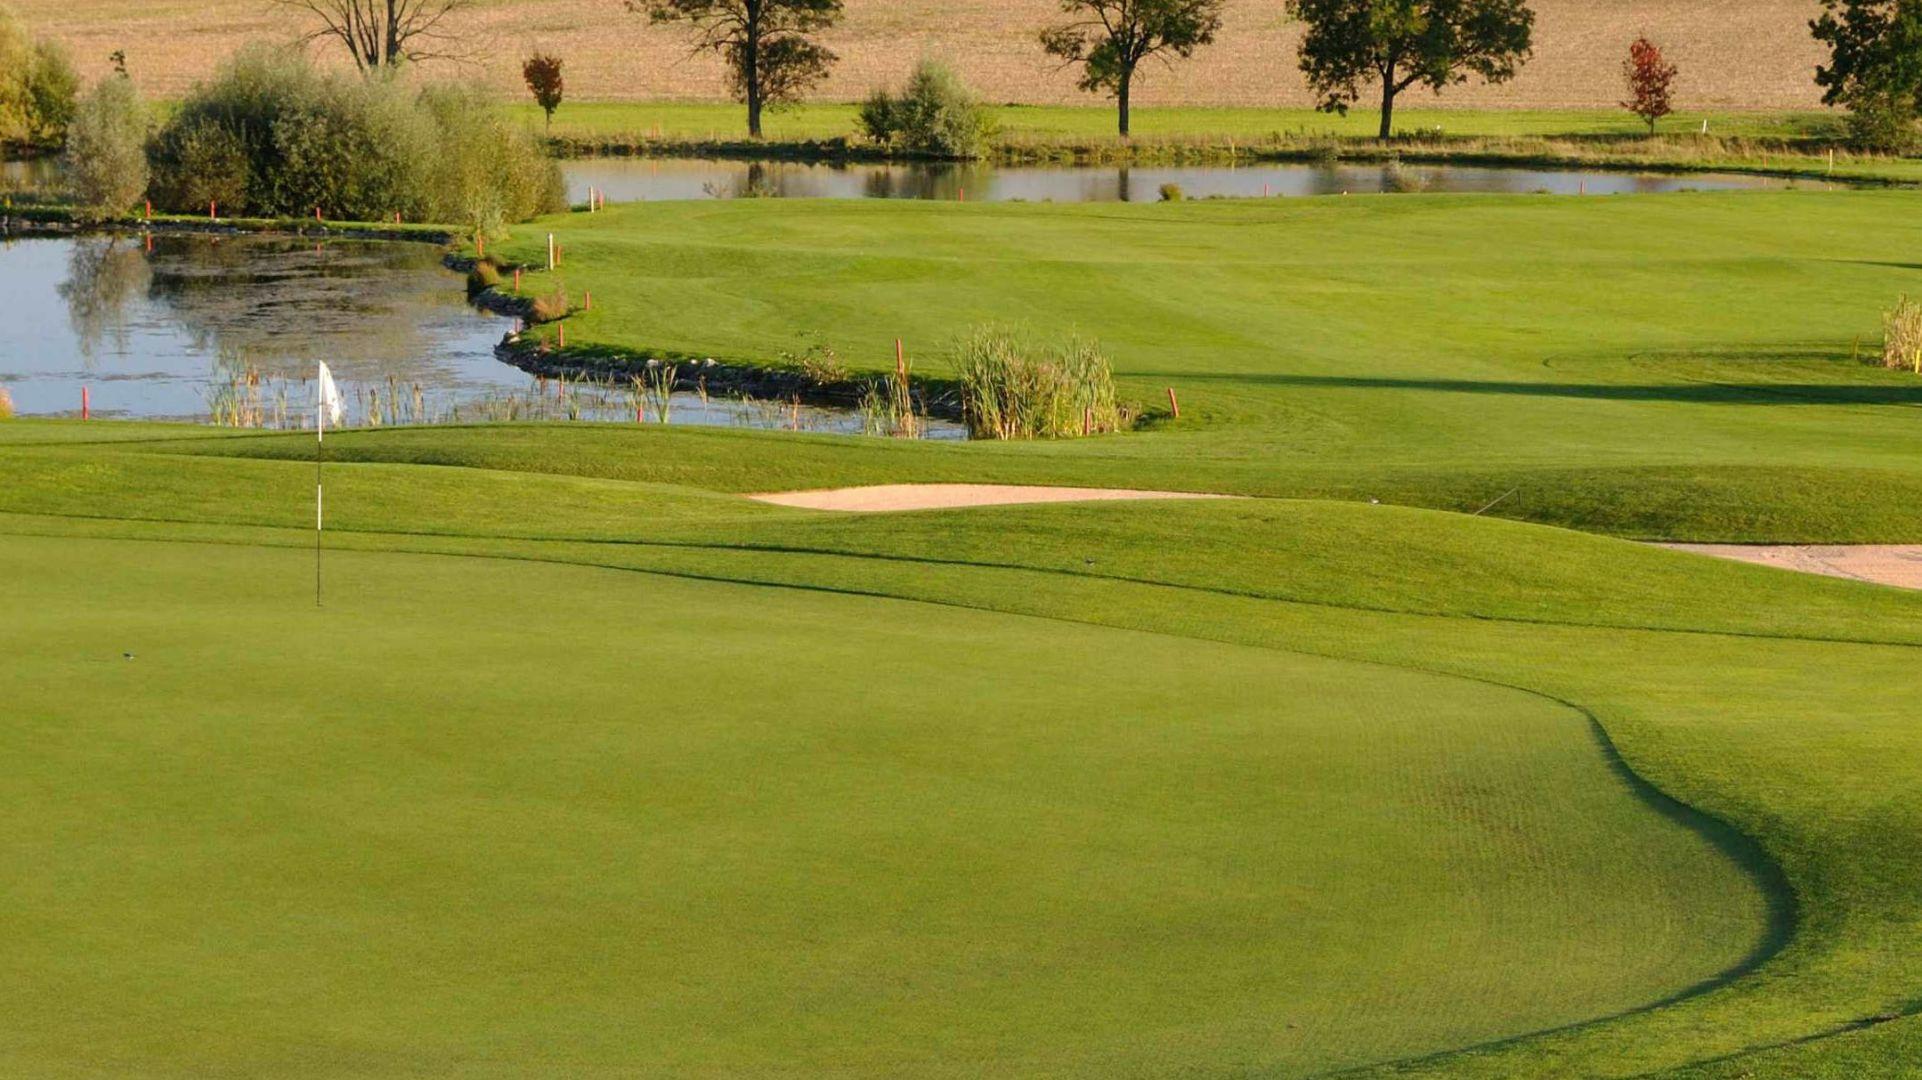 Golfplatz in Markt Indersdorf